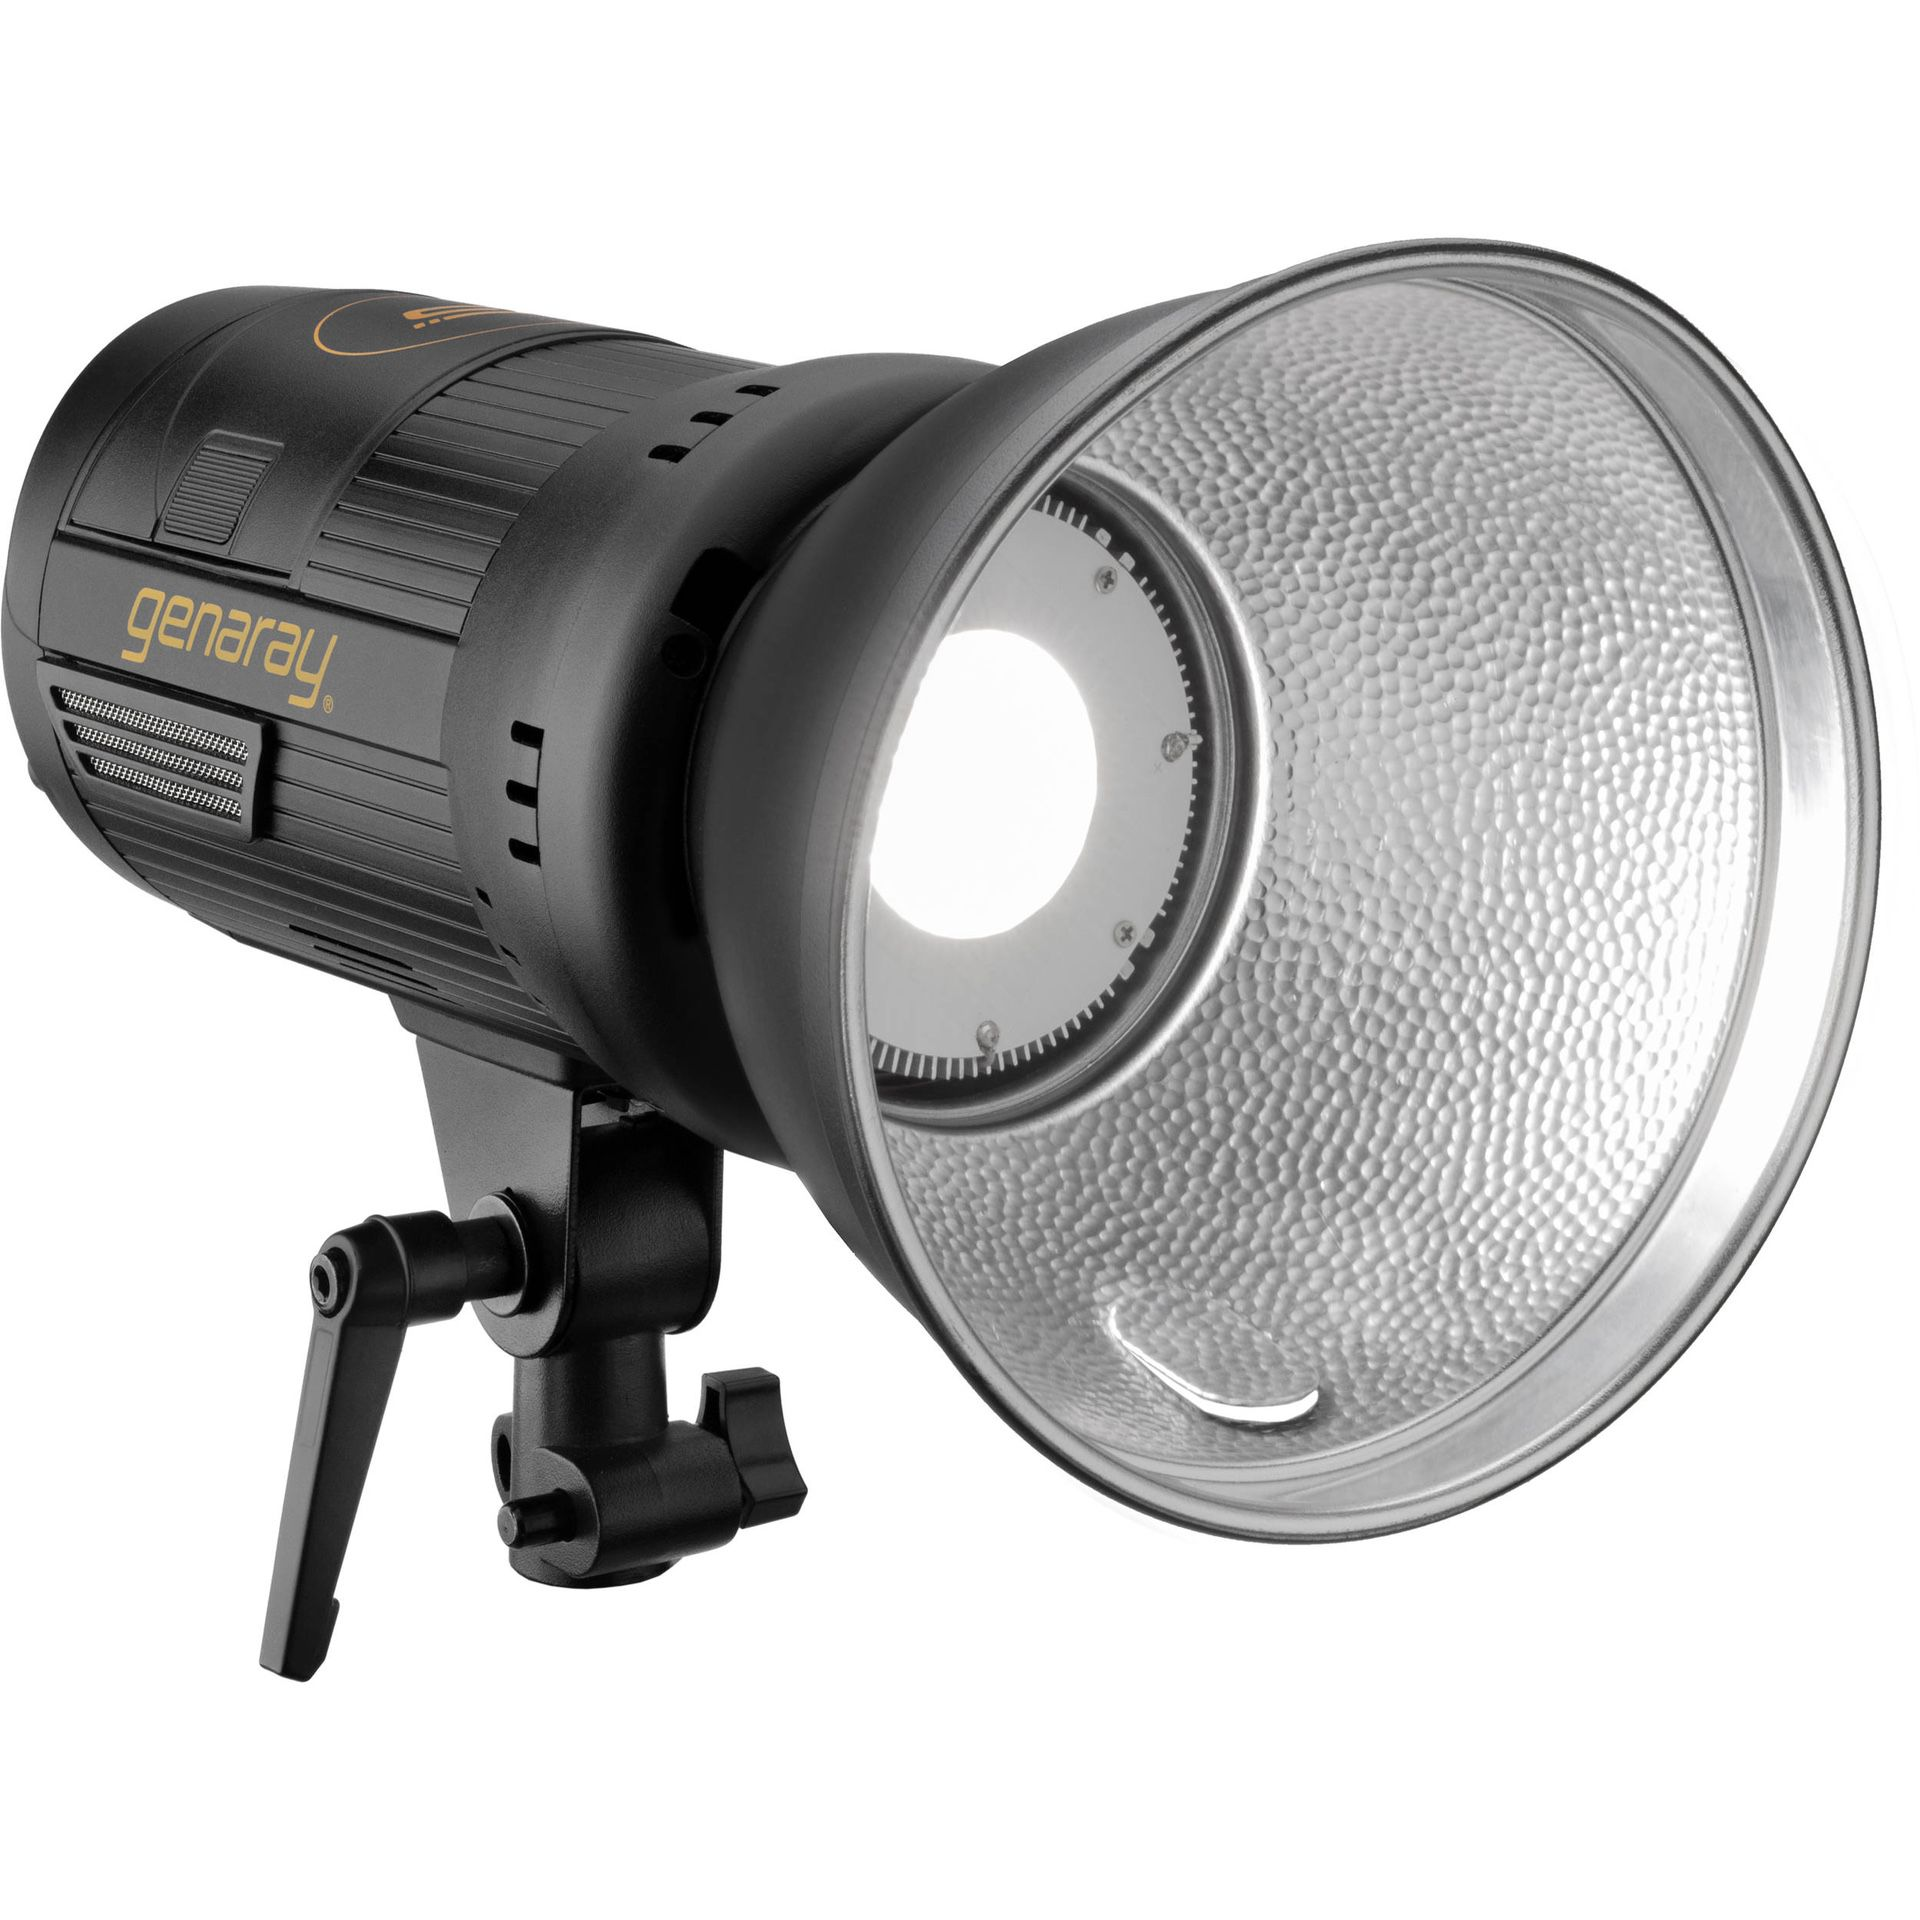 Genaray PortaBright Bi-Color LED Monolight (fixture)